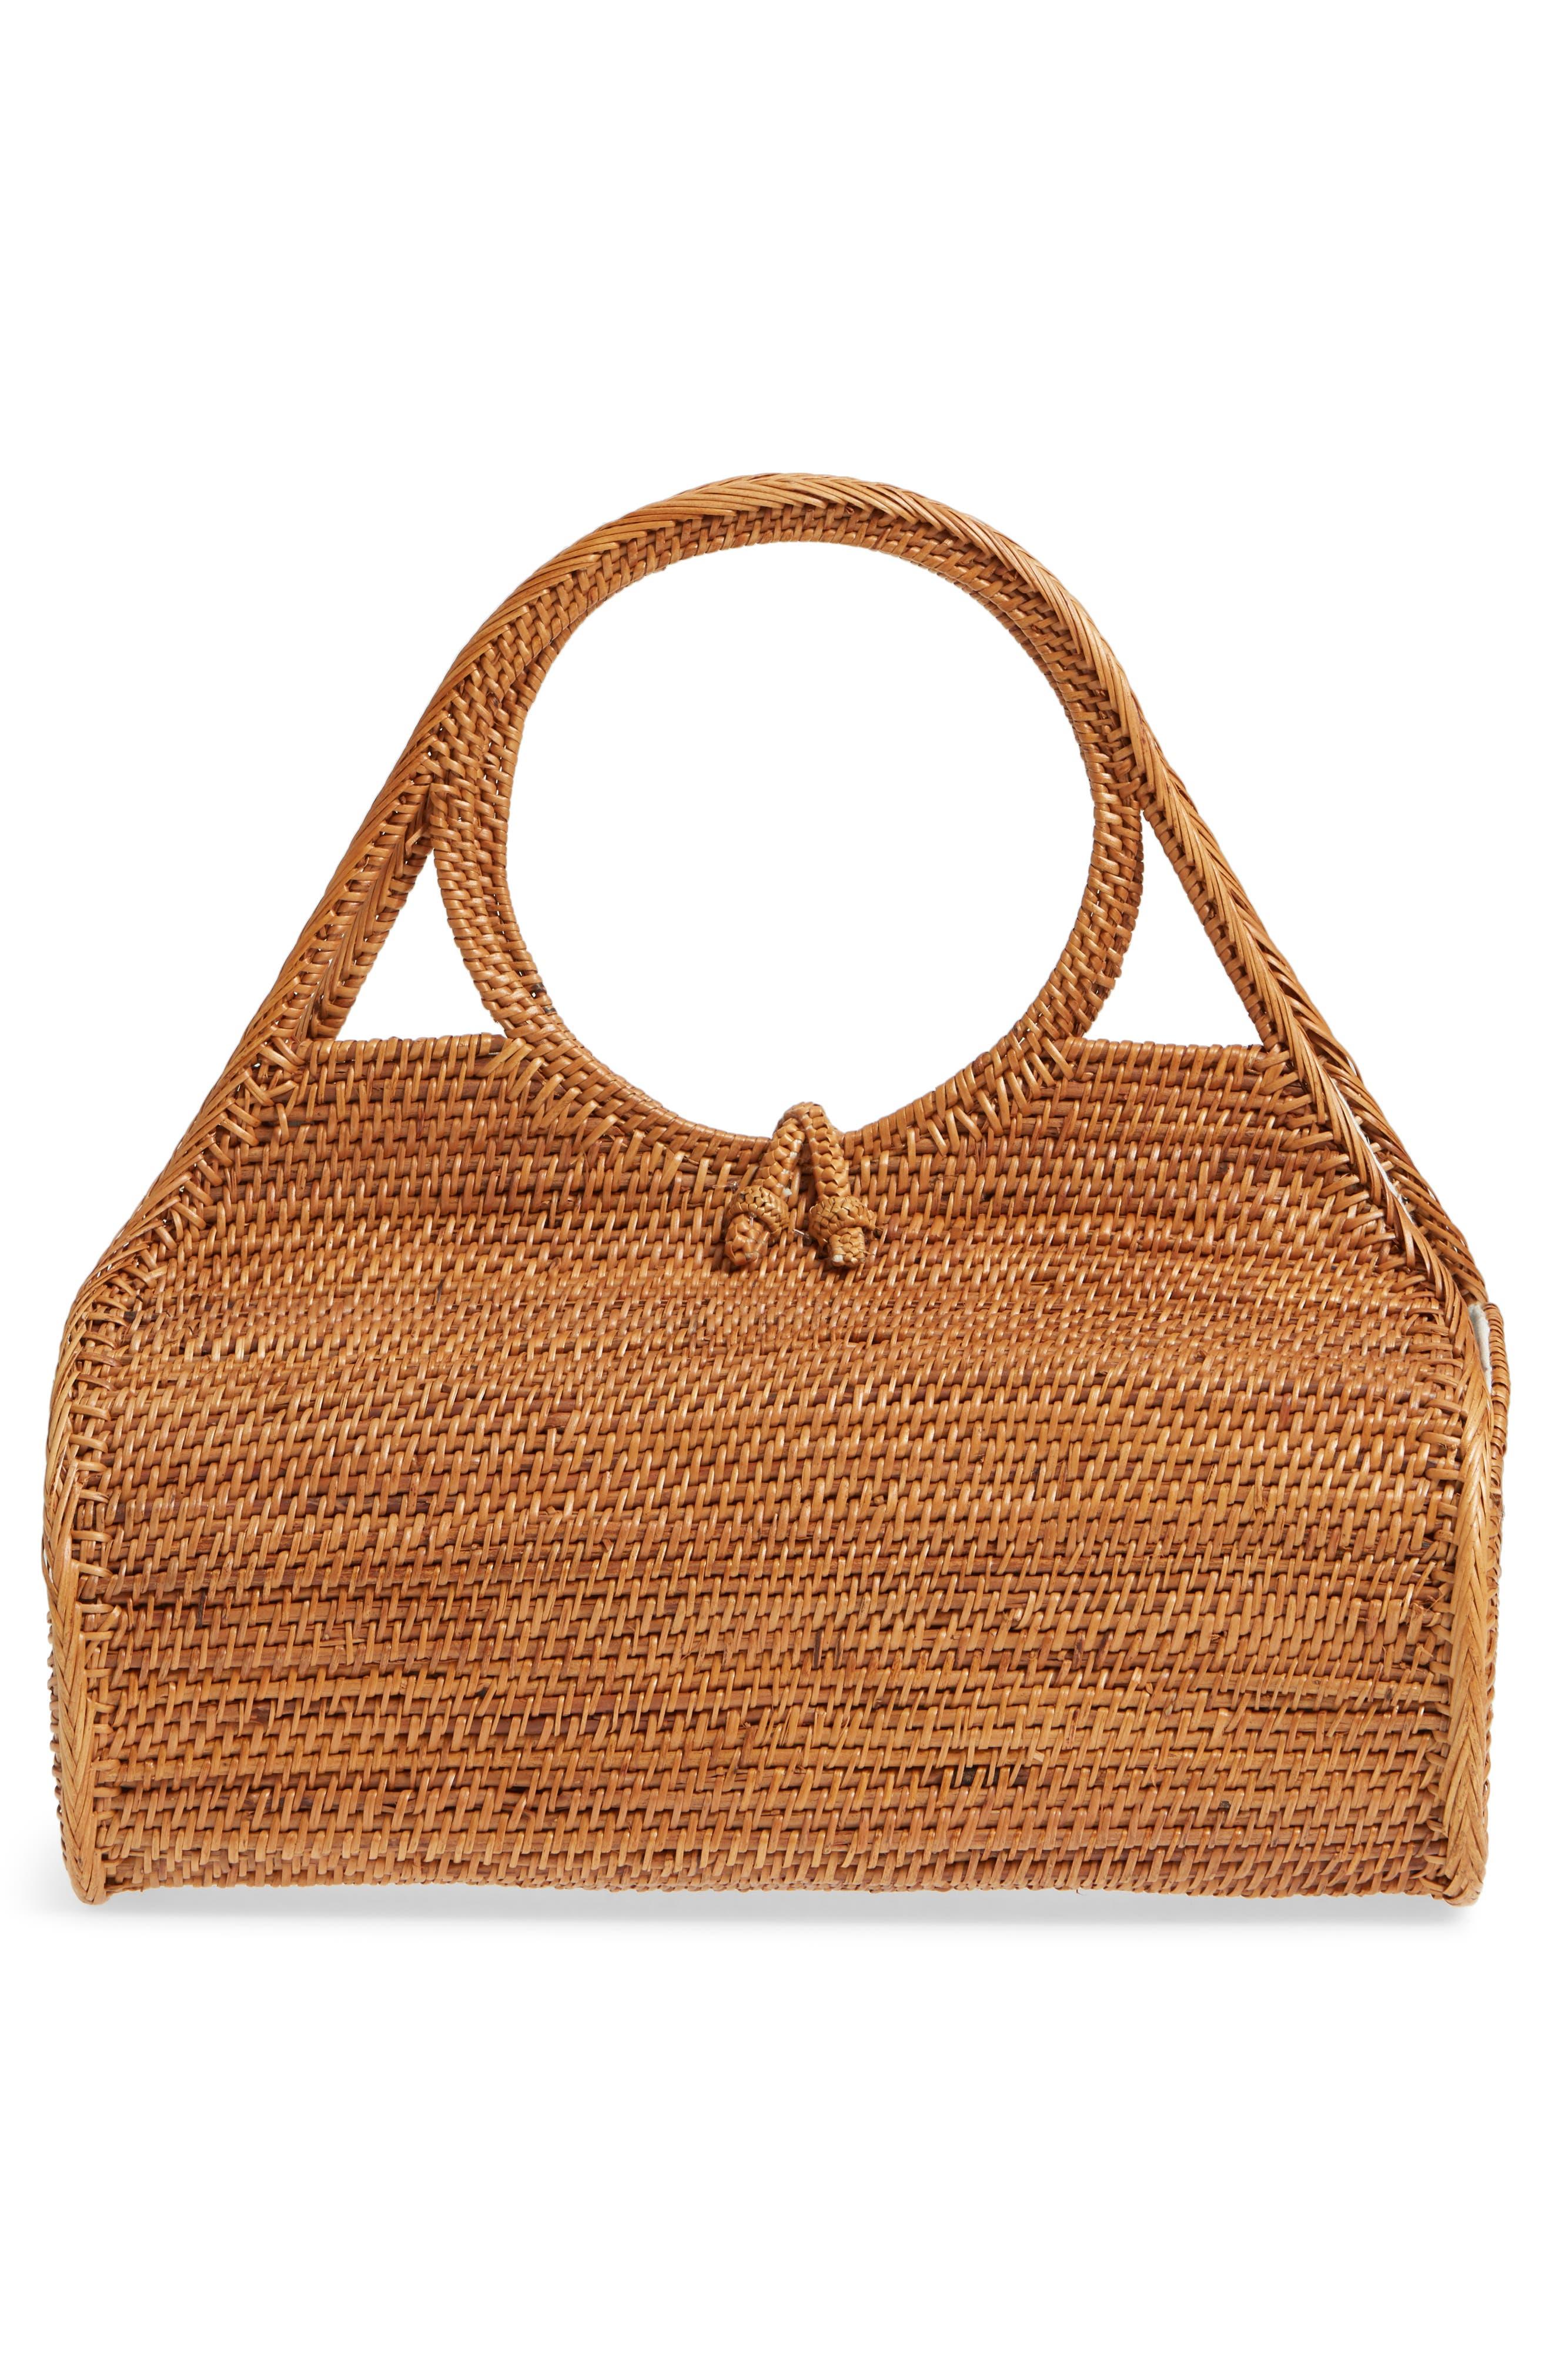 Woven Rattan Handbag,                             Alternate thumbnail 3, color,                             Tan